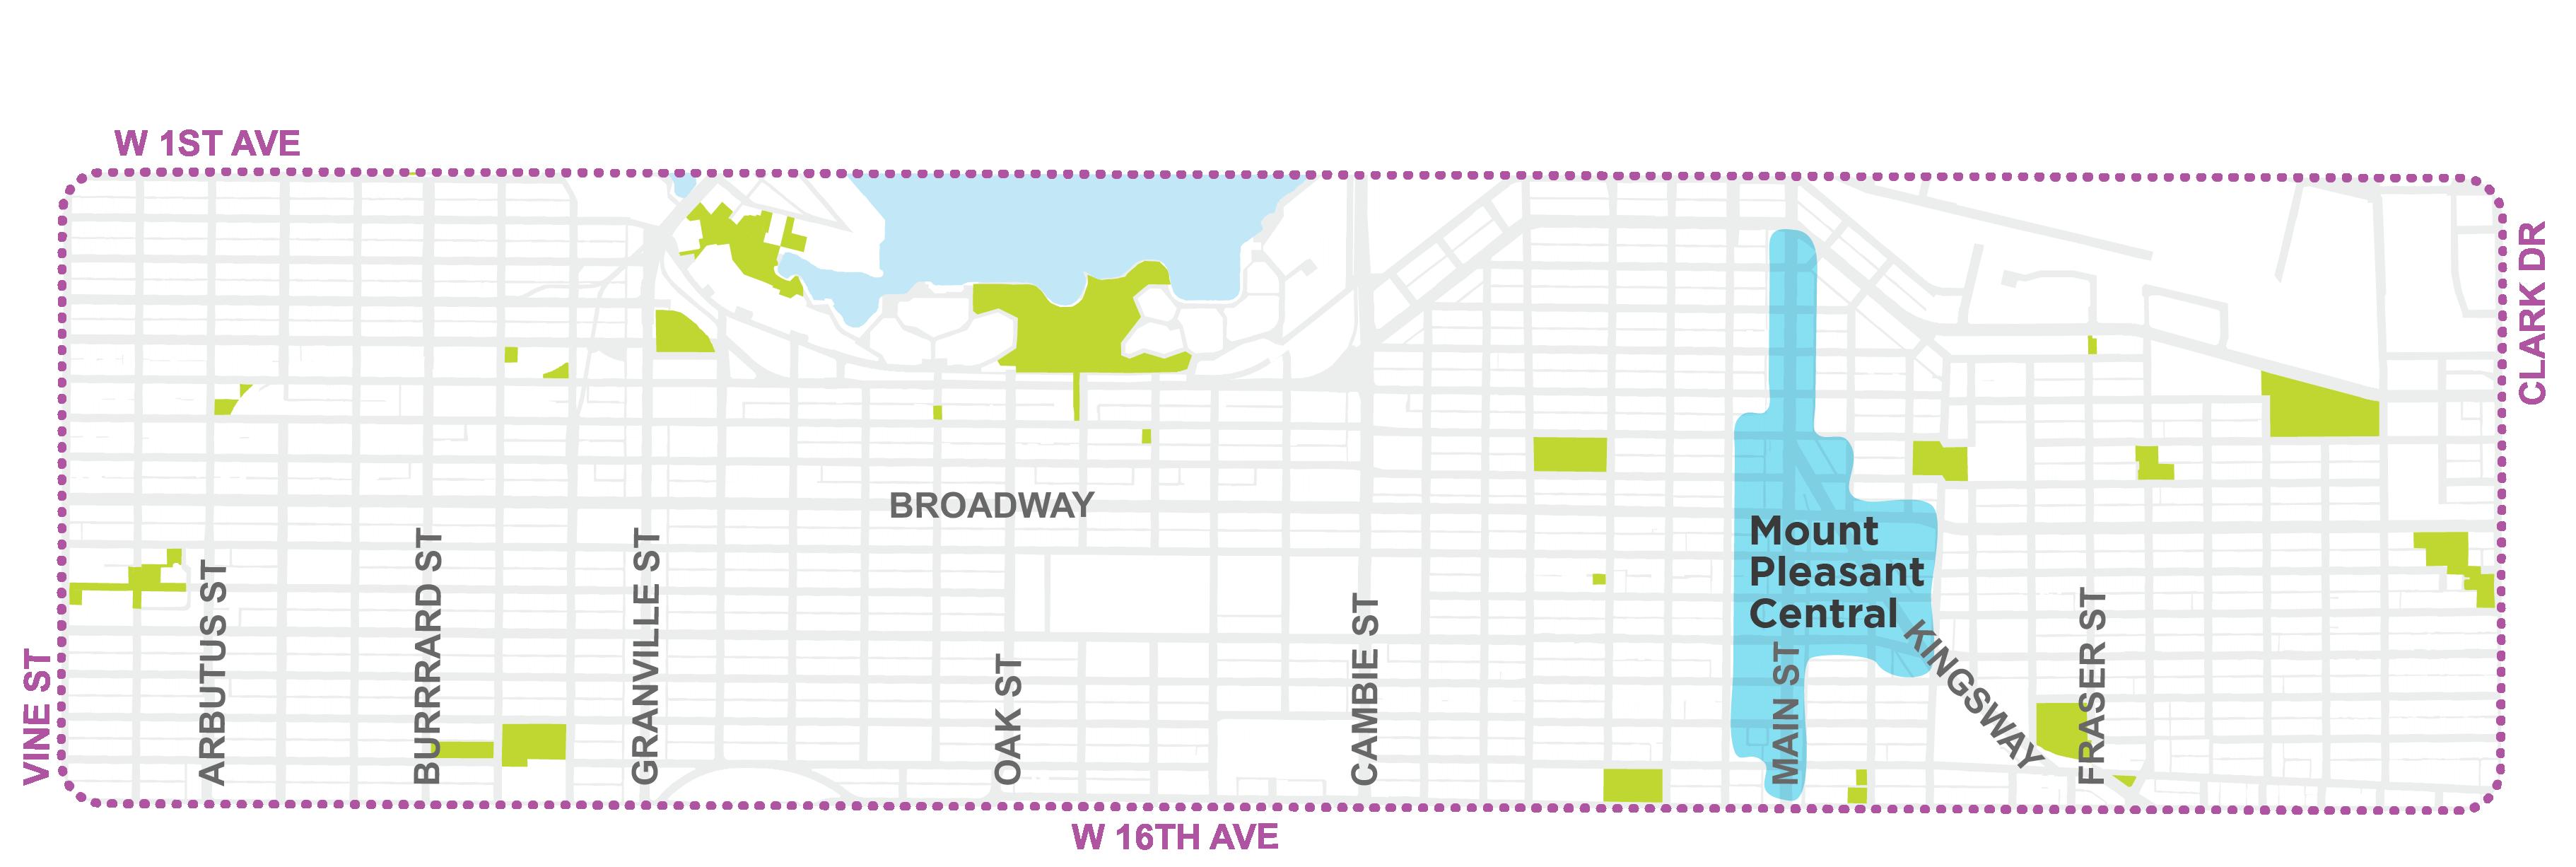 Mt Pleasant Central Map